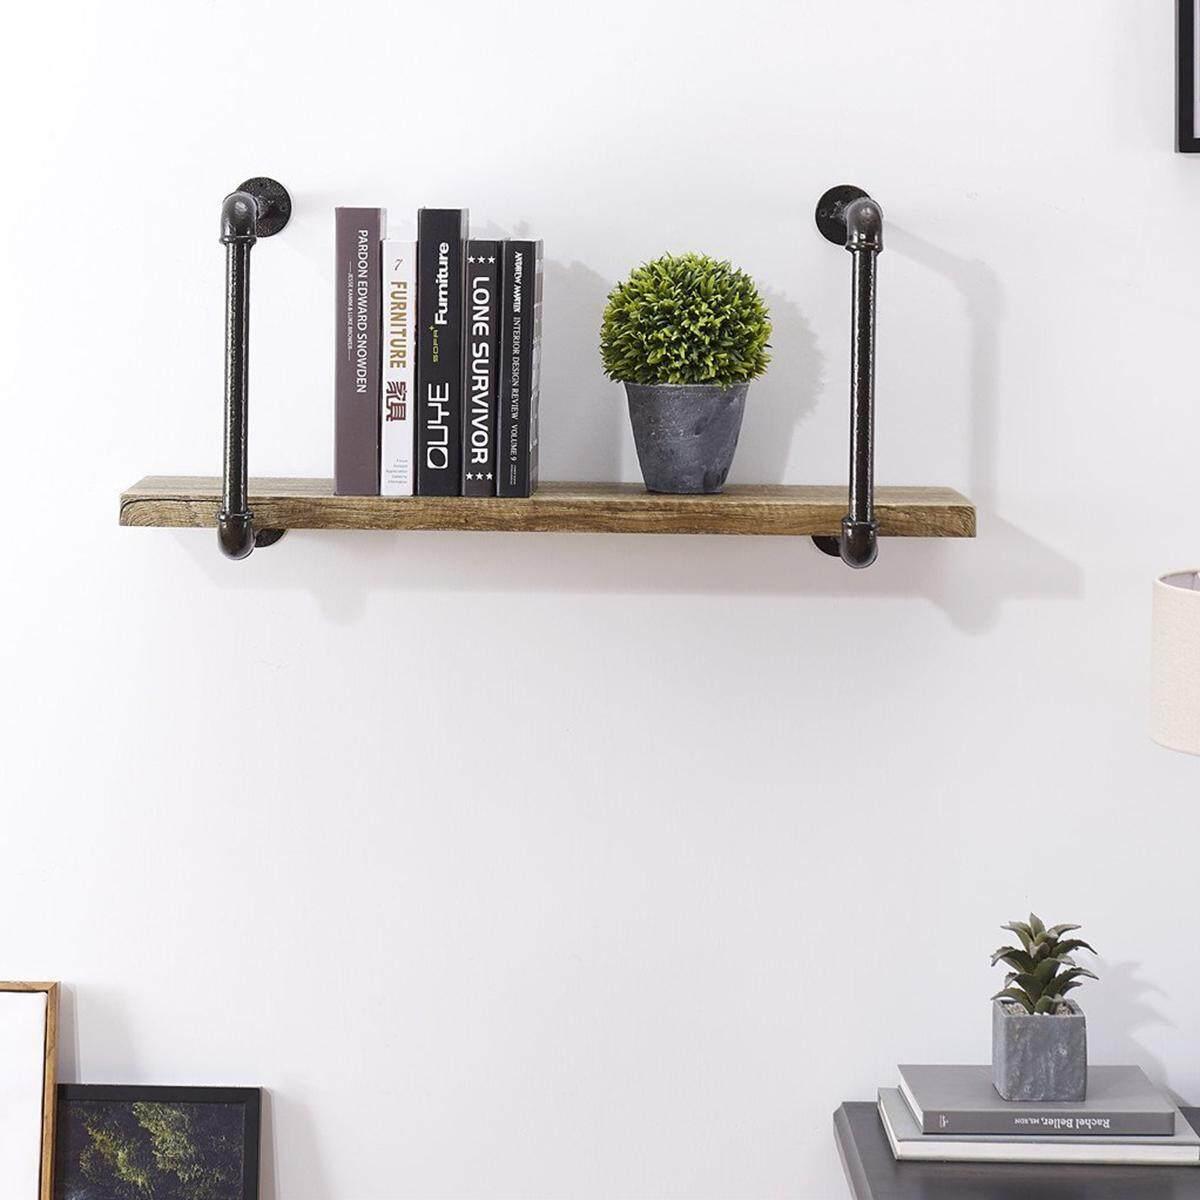 Rustic Wood Iron Pipe Frame Floating Shelving Shelf Rack Wall Mounted Storage